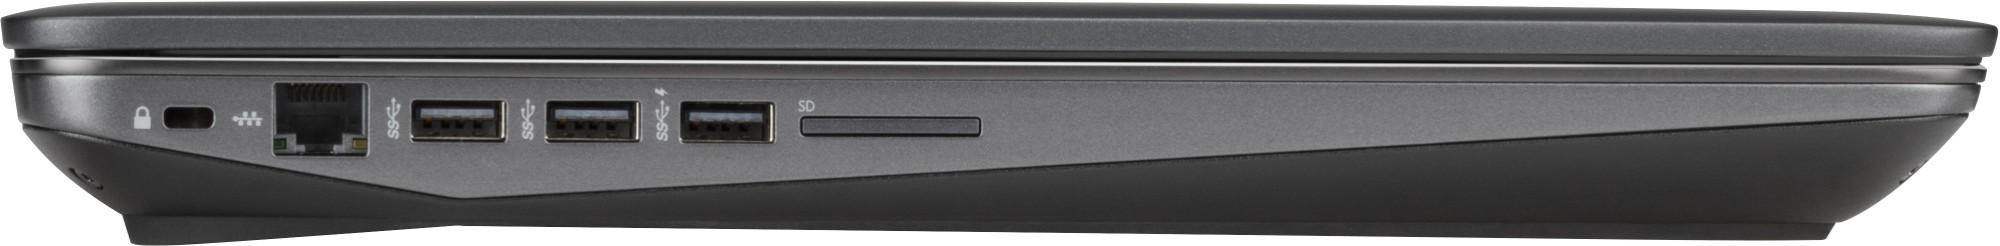 HP ZBook 17 G3 Mobile Workstation